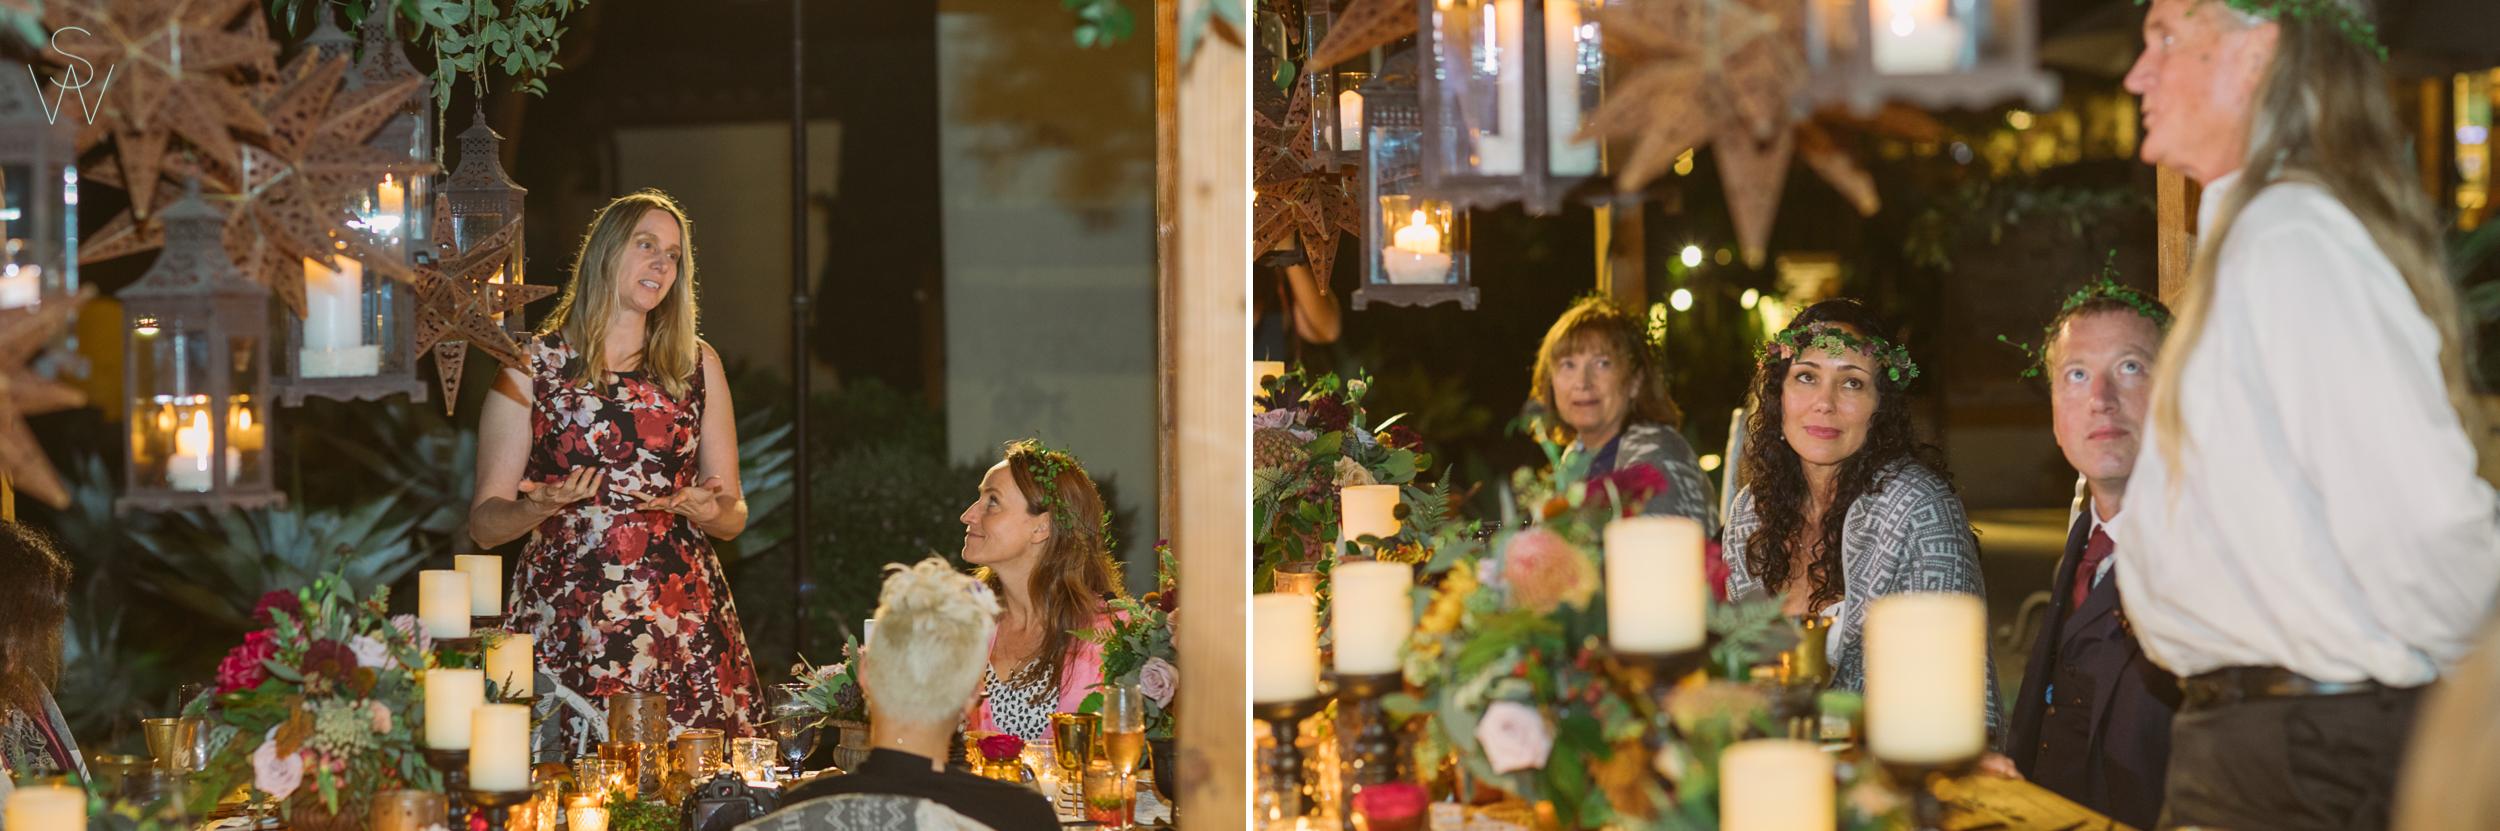 197Estancia.Shewanders.Wedding.Photography.JPG